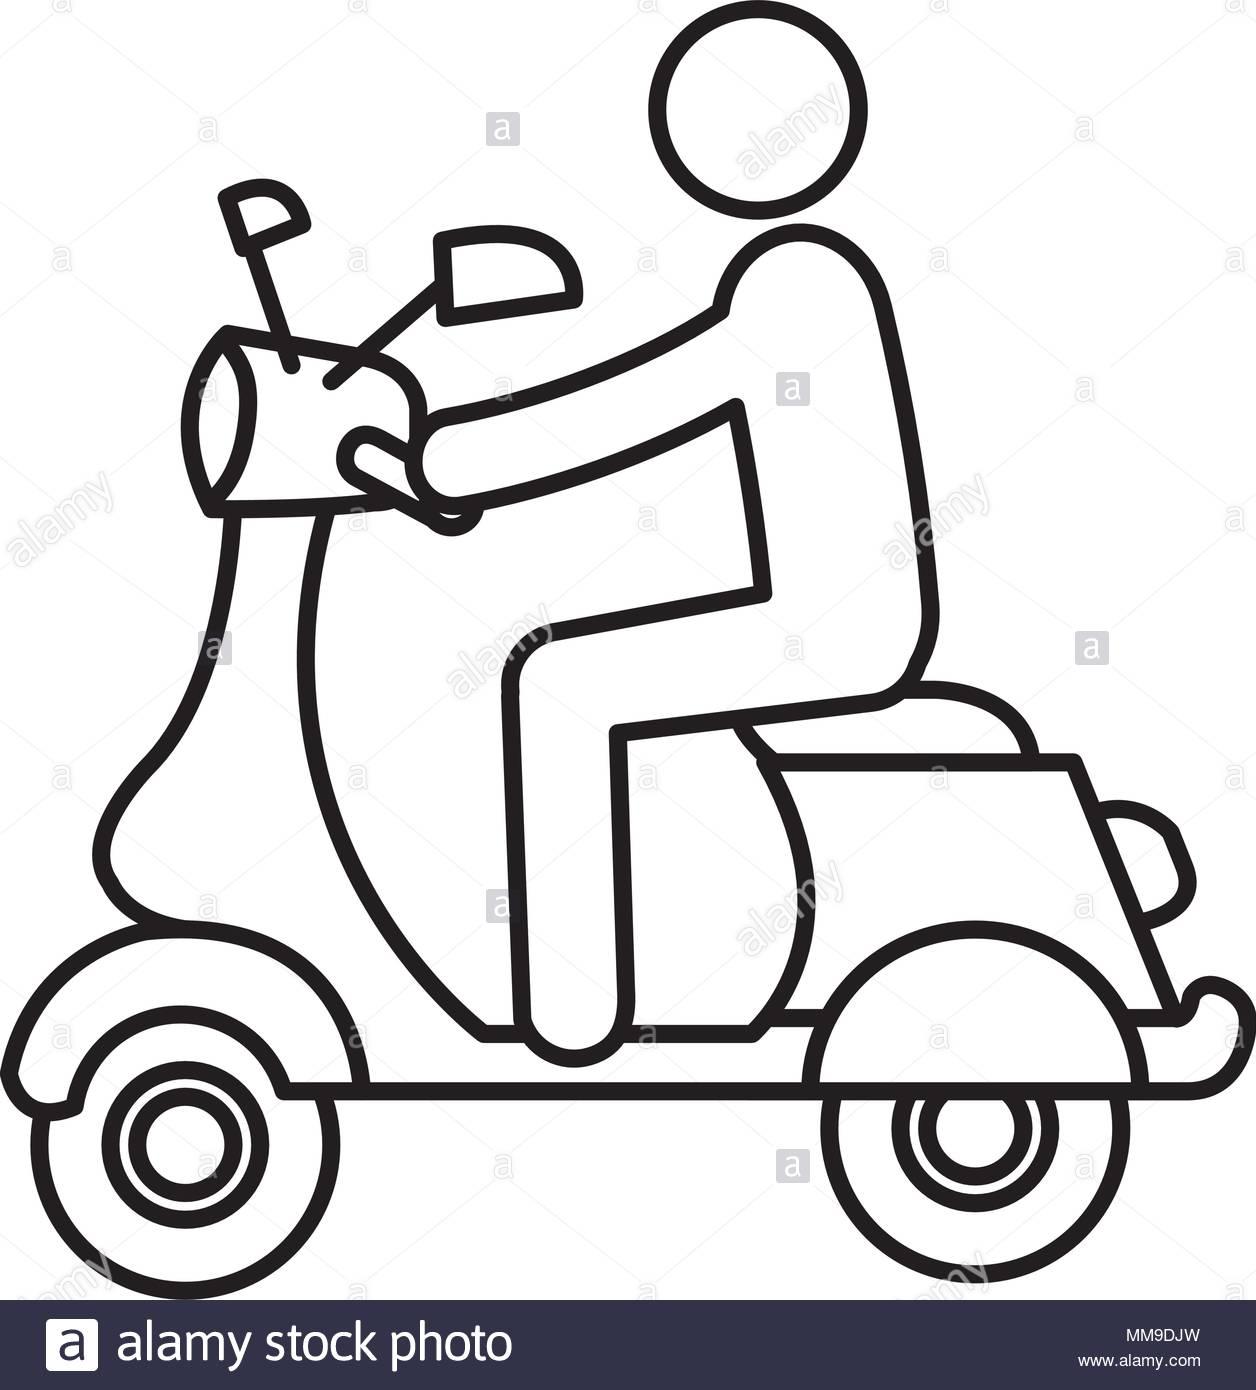 1256x1390 Motorcycle Silhouette Stock Photos Amp Motorcycle Silhouette Stock